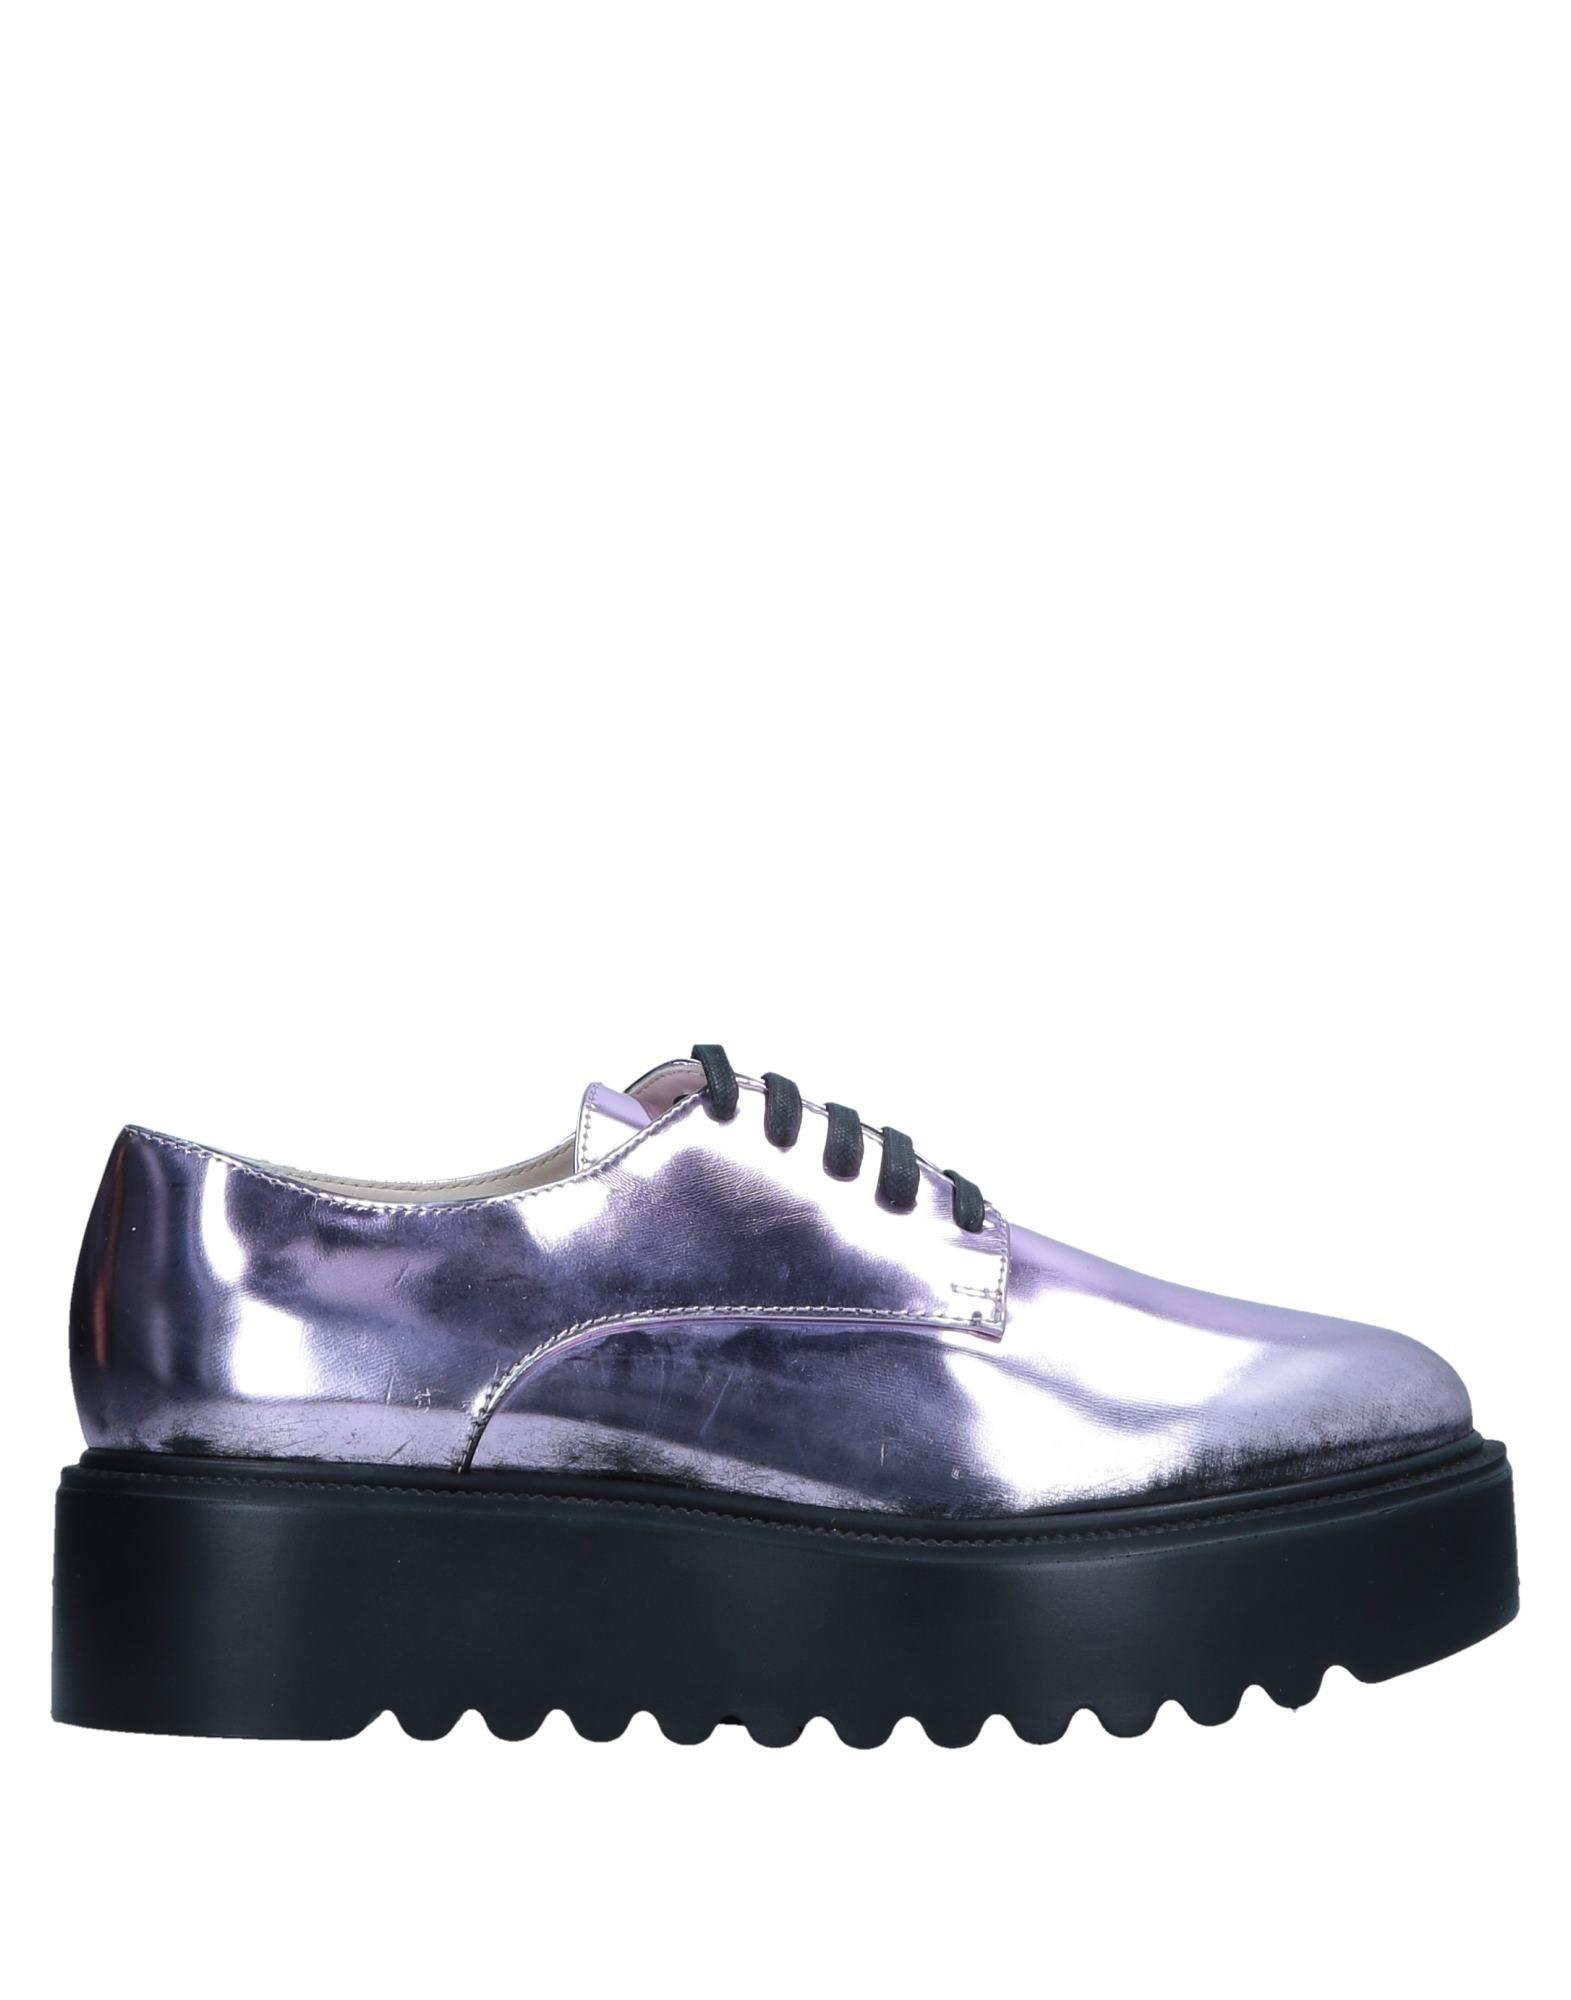 Фото - PINKO Обувь на шнурках обувь на высокой платформе dkny